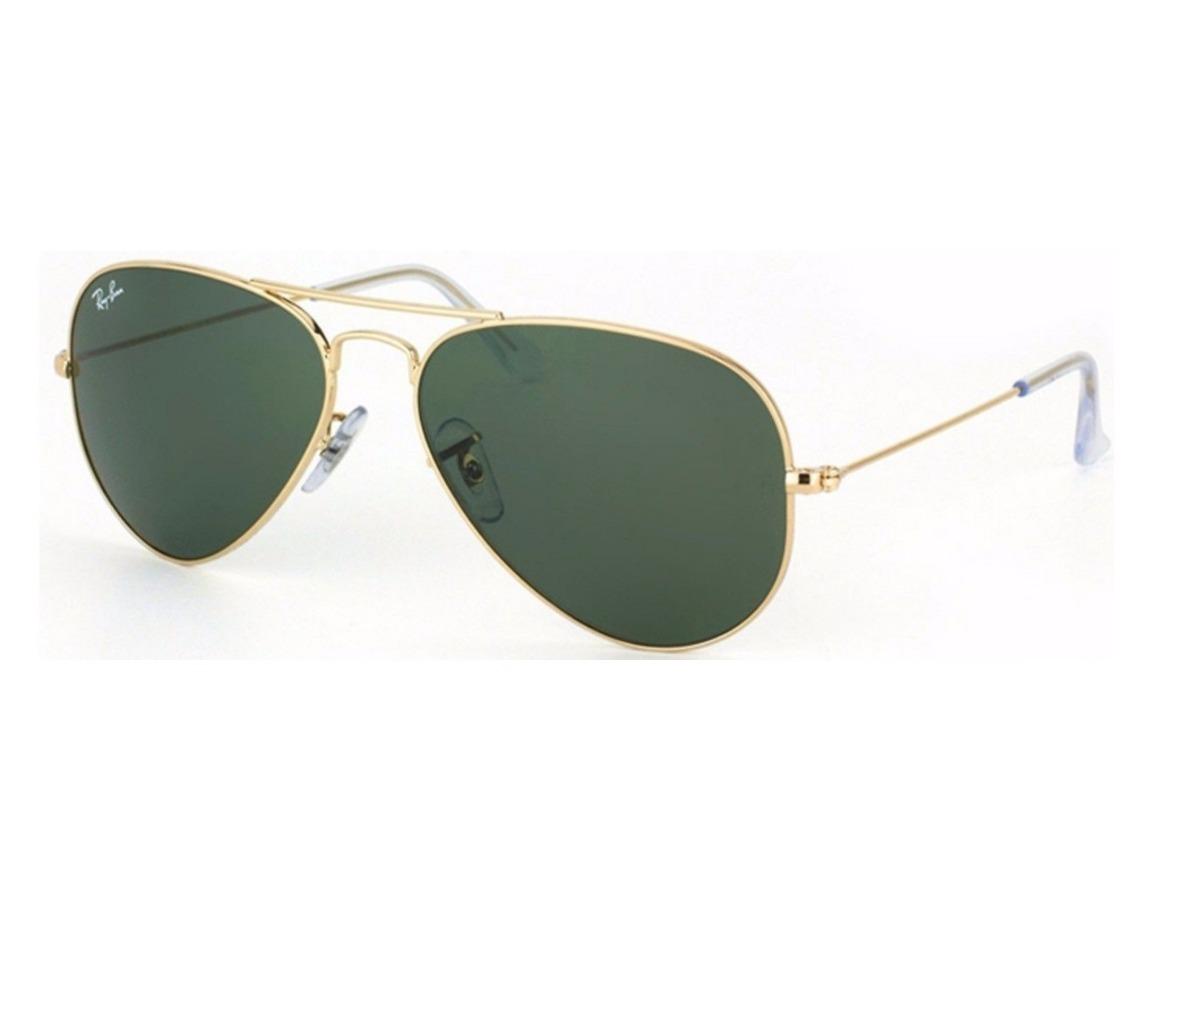 f872aa4e2ff79 óculos de sol ray ban aviador verde g15 dourado original. Carregando zoom.